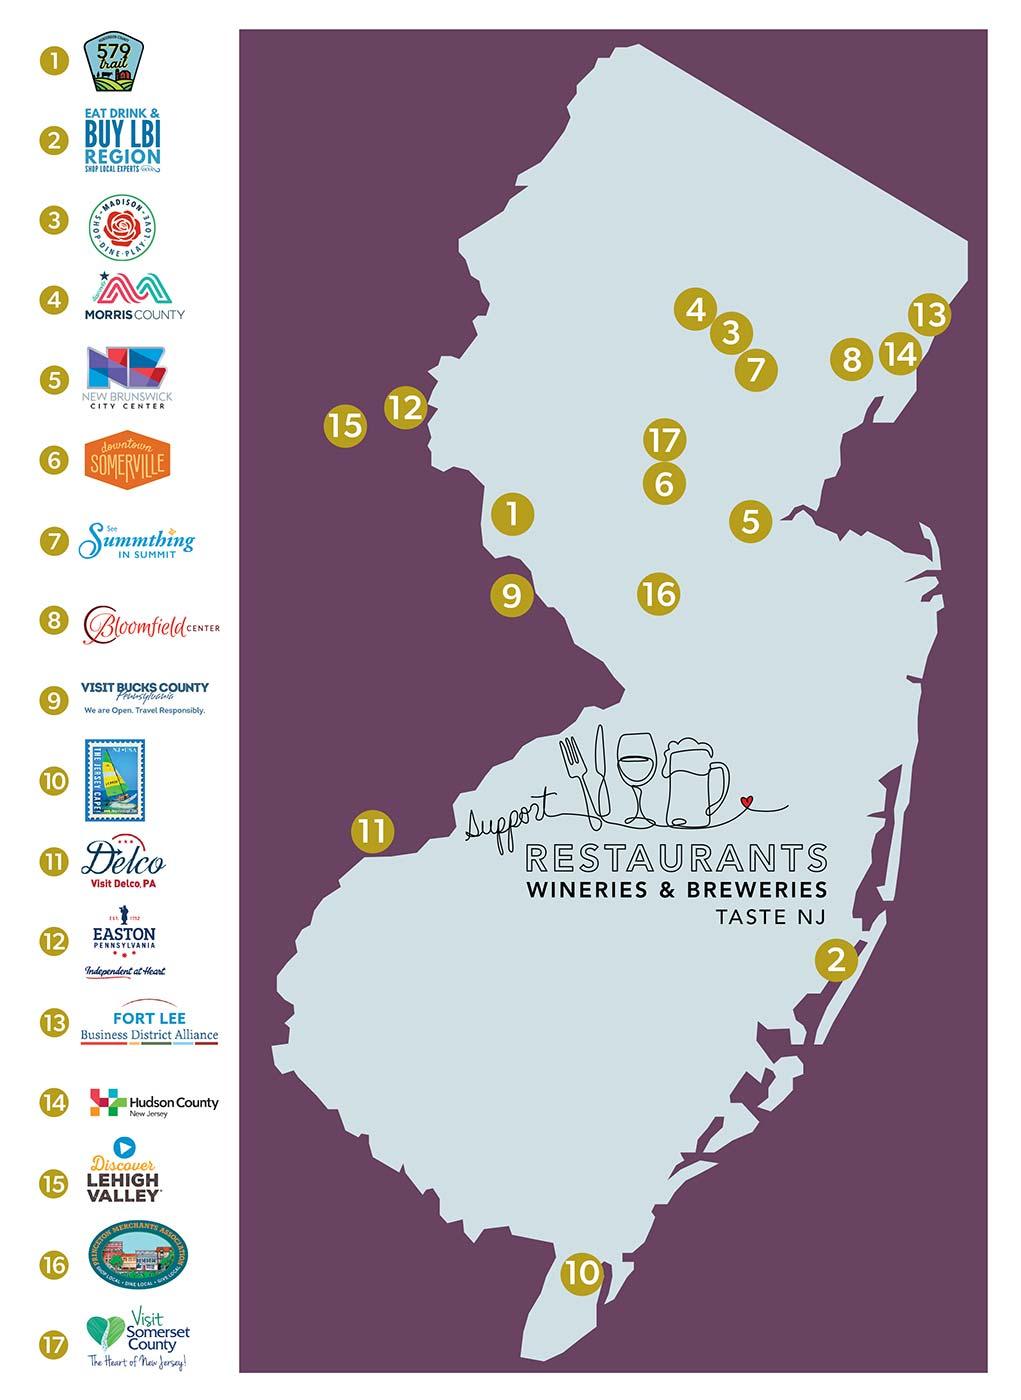 edible destinations map